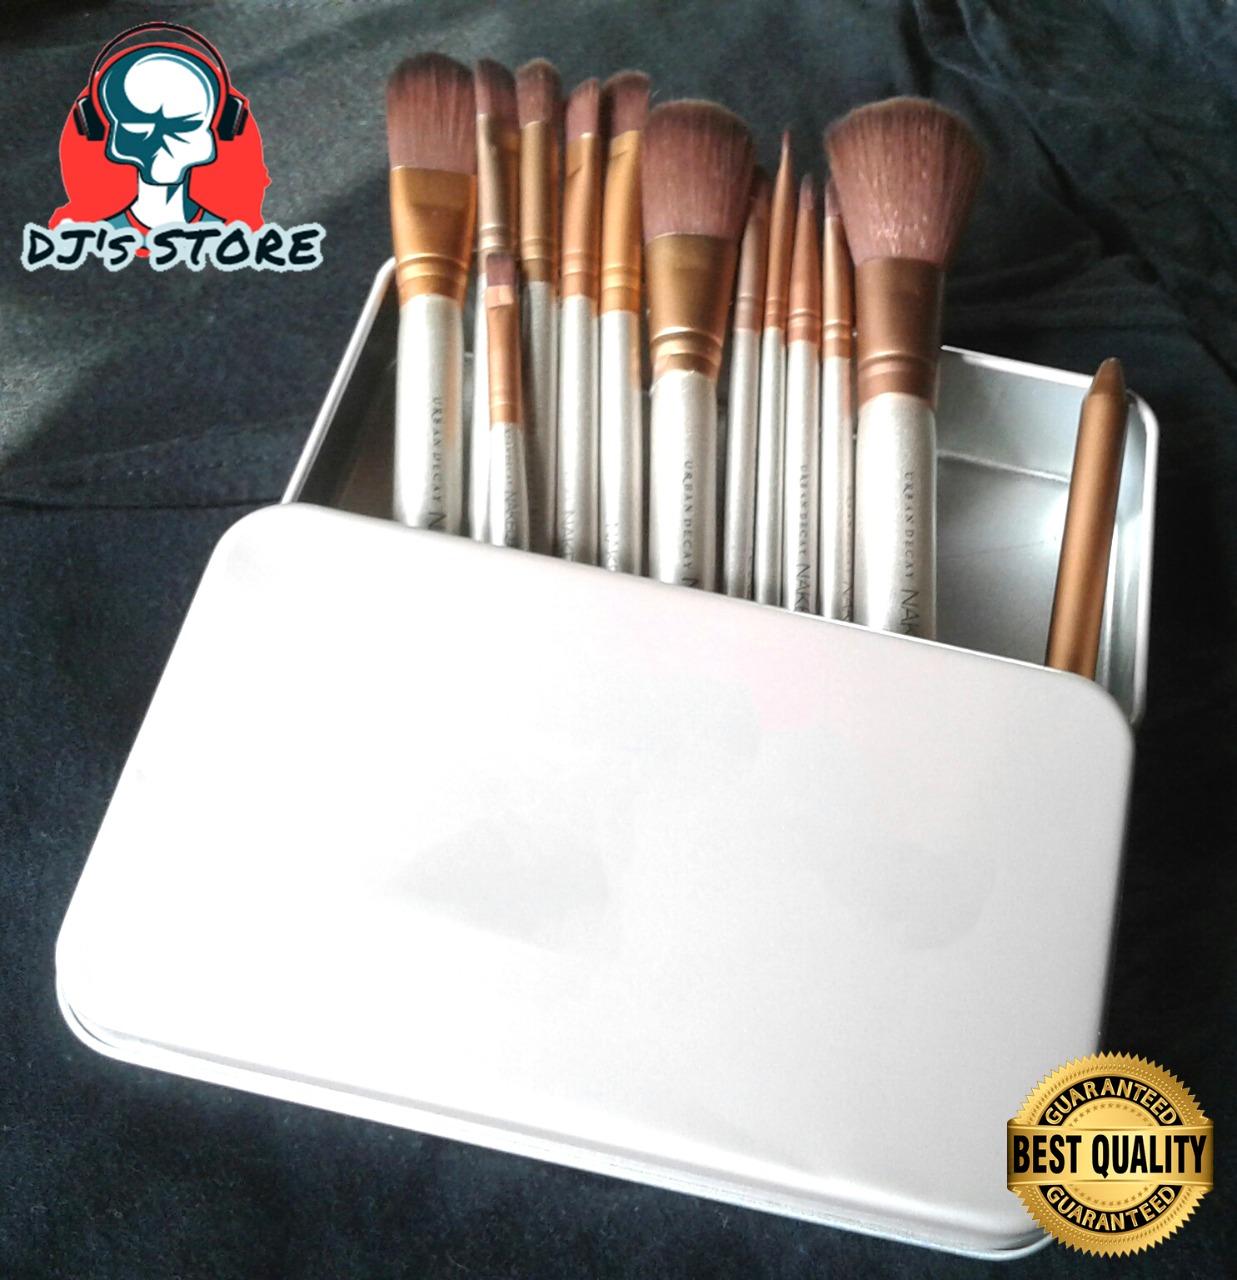 Makeup Brushes for women  Makeup Brushes  Pack of 12 Makeup Brushes  Makeup Brushes Pack of 12 for Women and Girls  Branded Makeup Brushes   Makeup Brushes set  Set of 12 Makeup Brushes